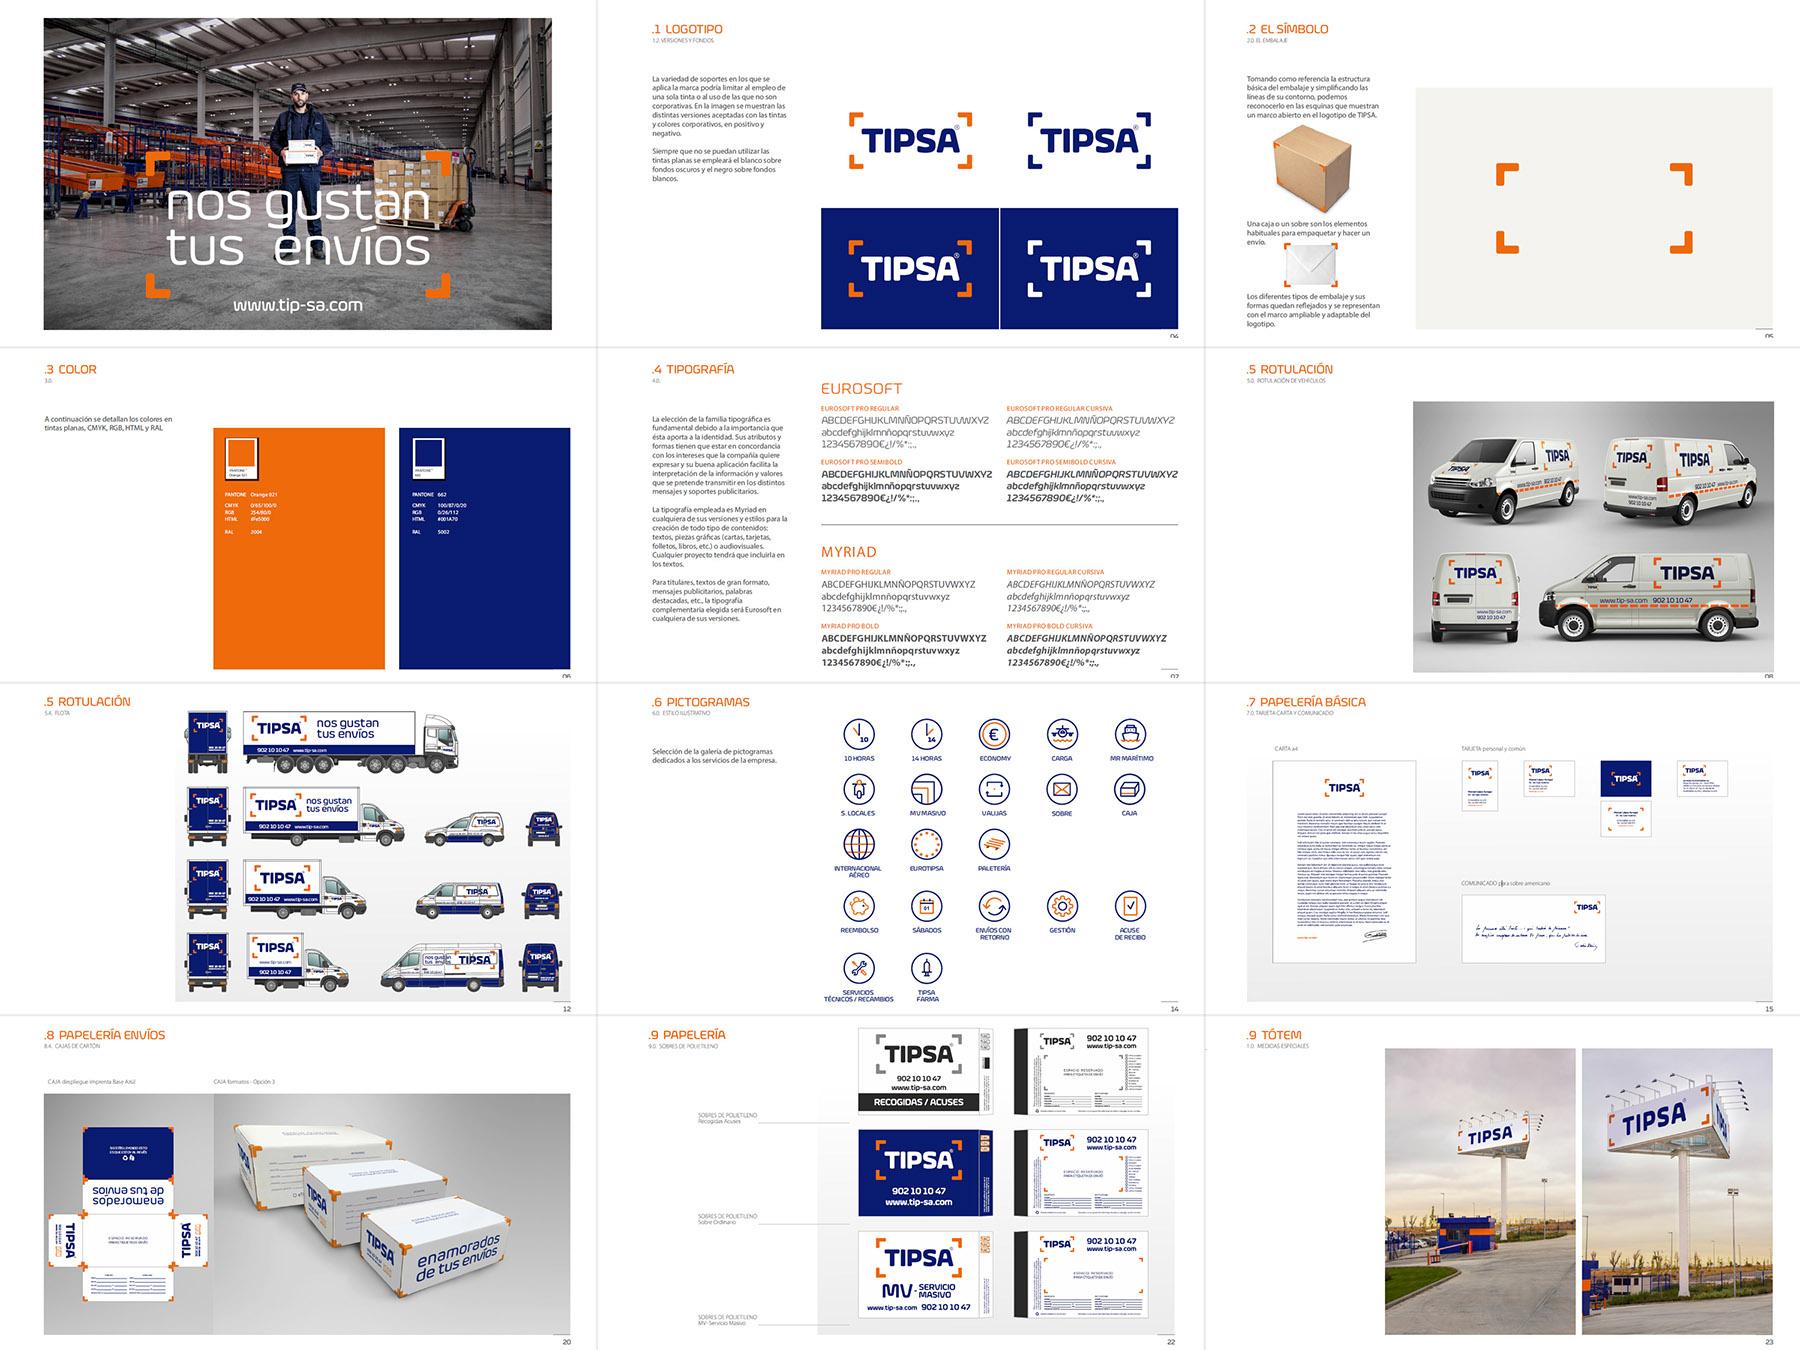 TIPSA - Transporte mensajeria y paqueteria urgente - Beusual